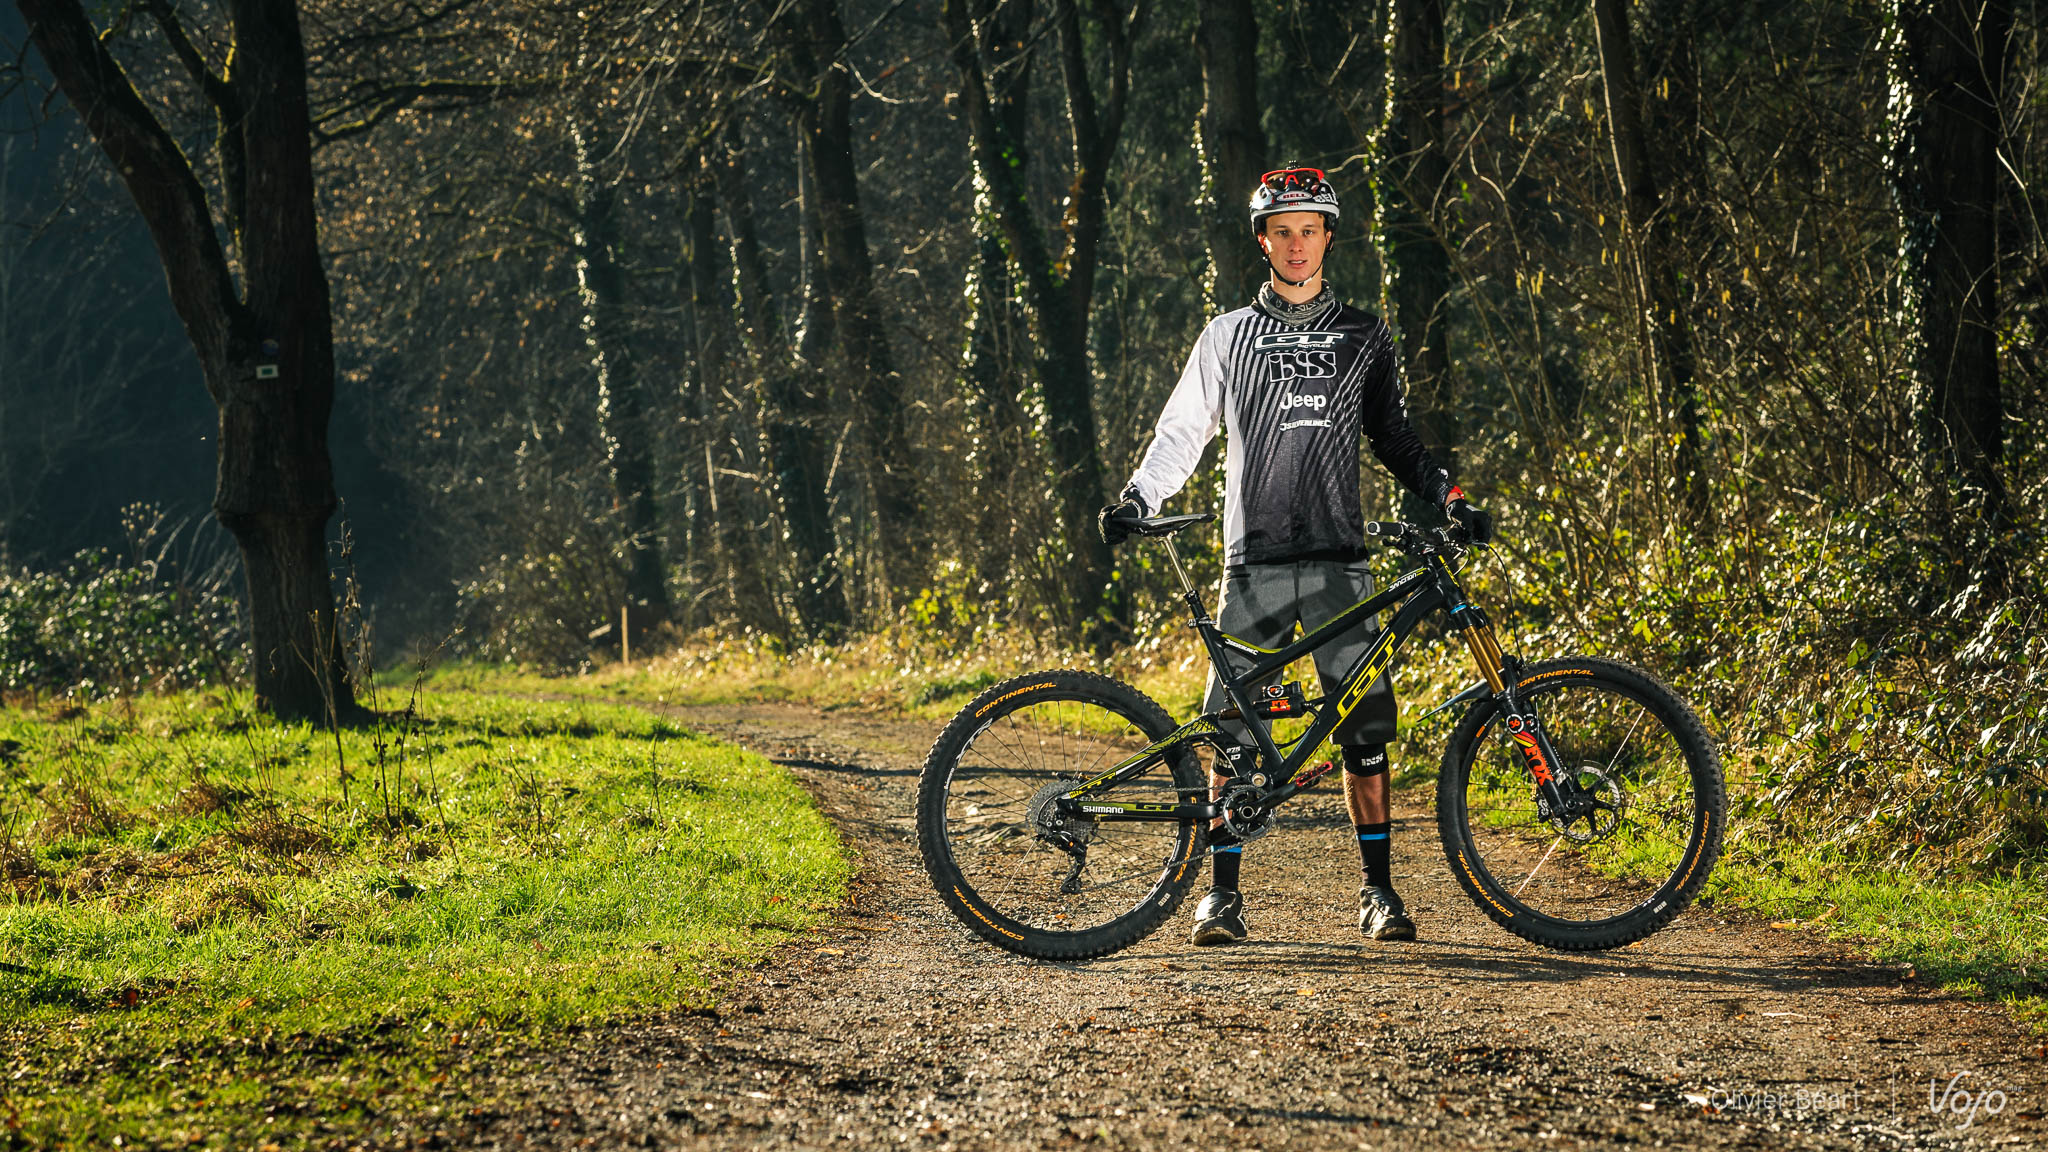 Martin_Maes_GT_Sanction_MTB_Bike_Check_Copyright_OBeart_VojoMag-1